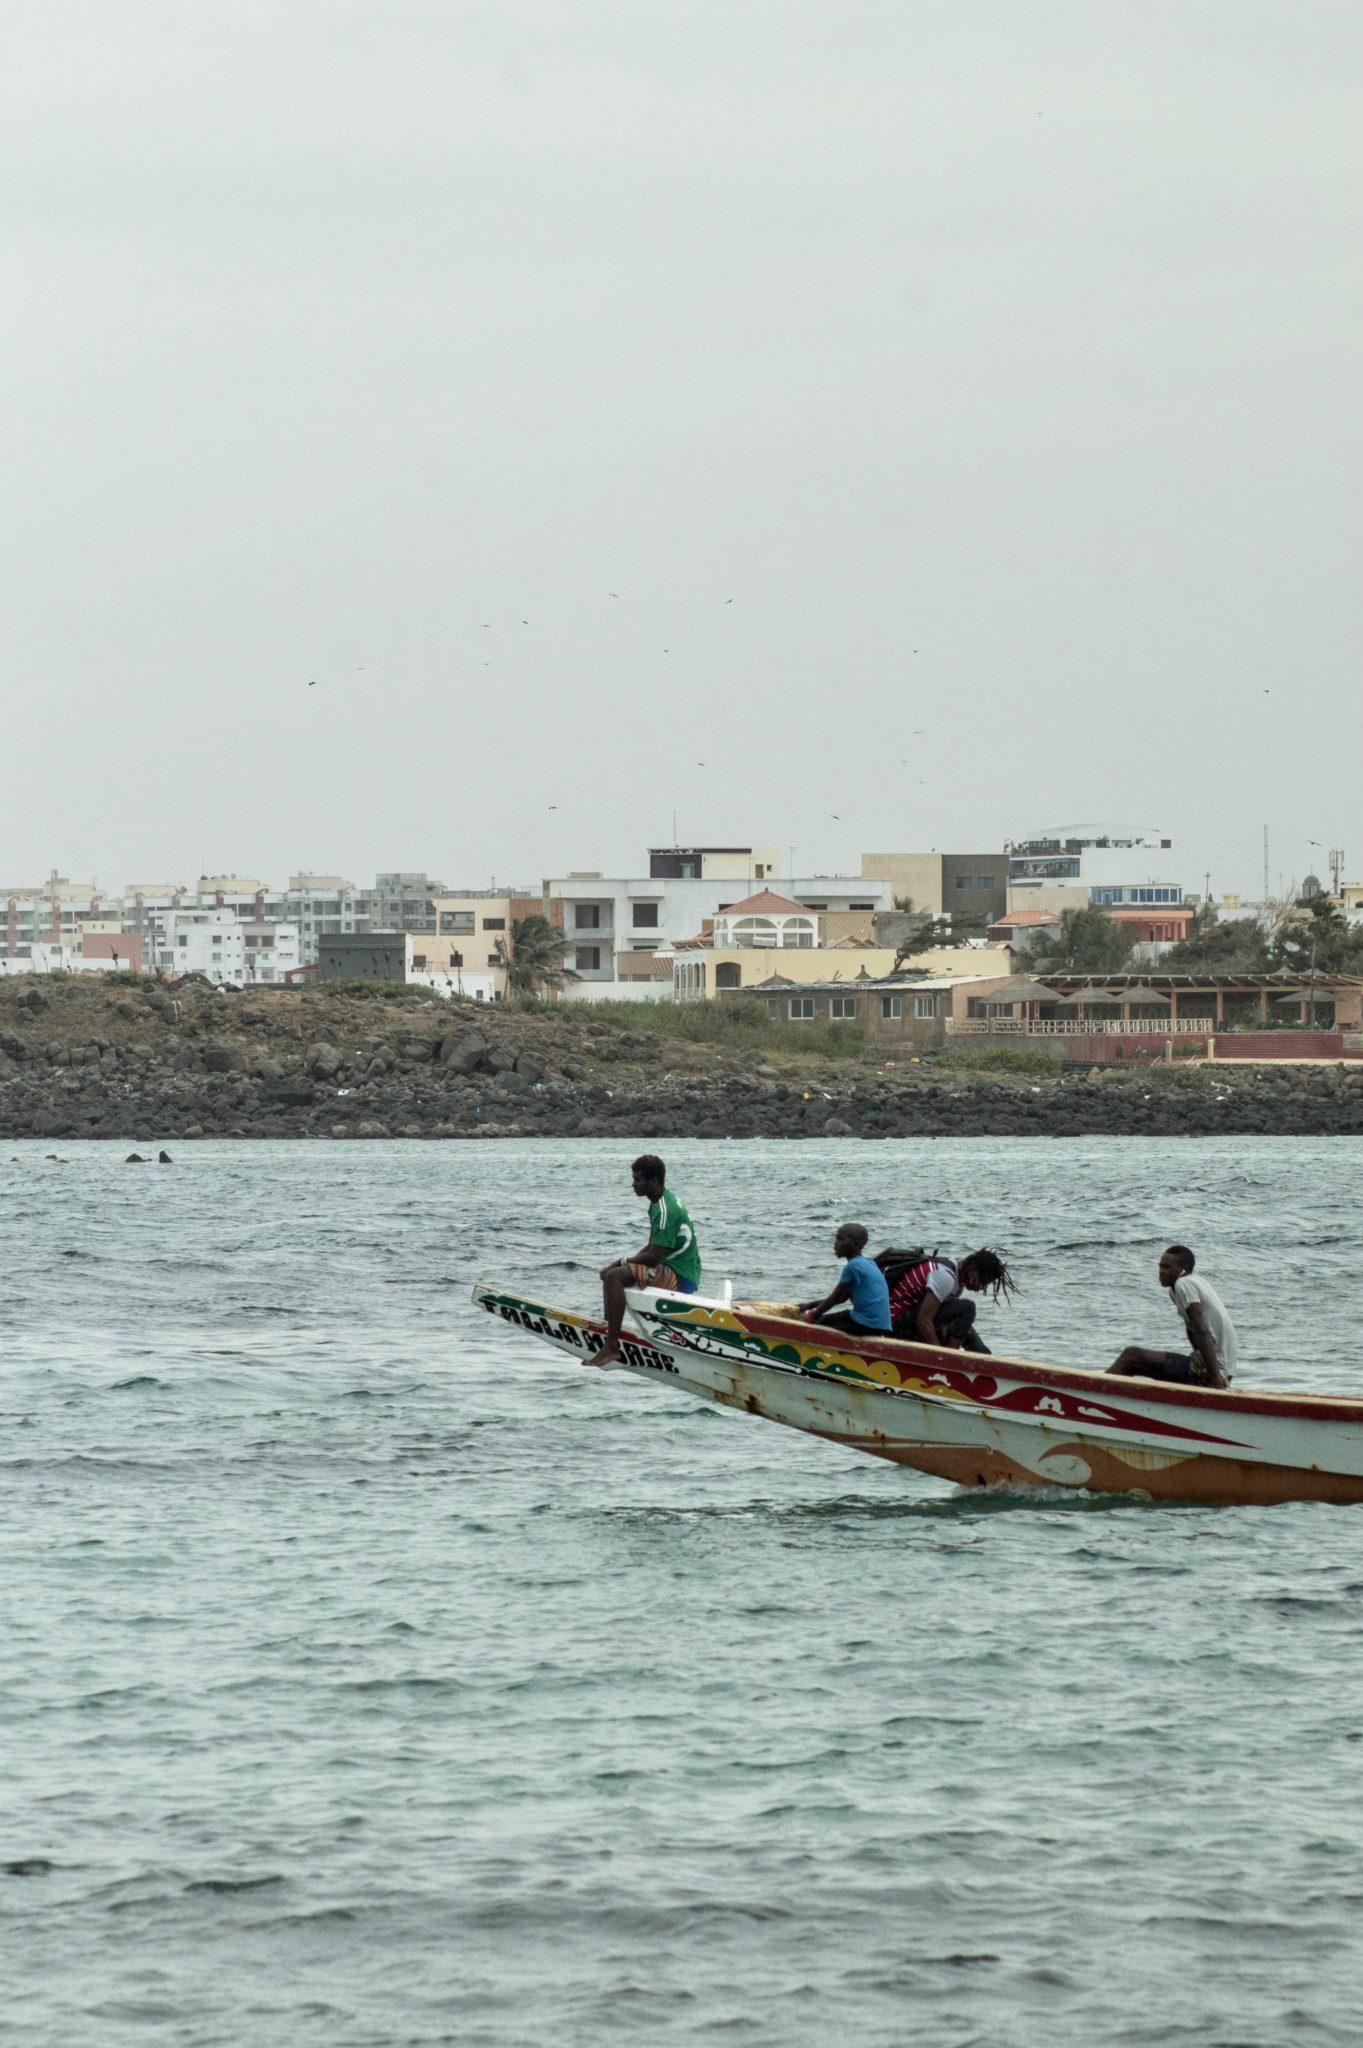 Surf Senegal: Die Anreise nach Ngor Island in Dakar erfolgt über kleine Holzboote, die in Ngor ablegen